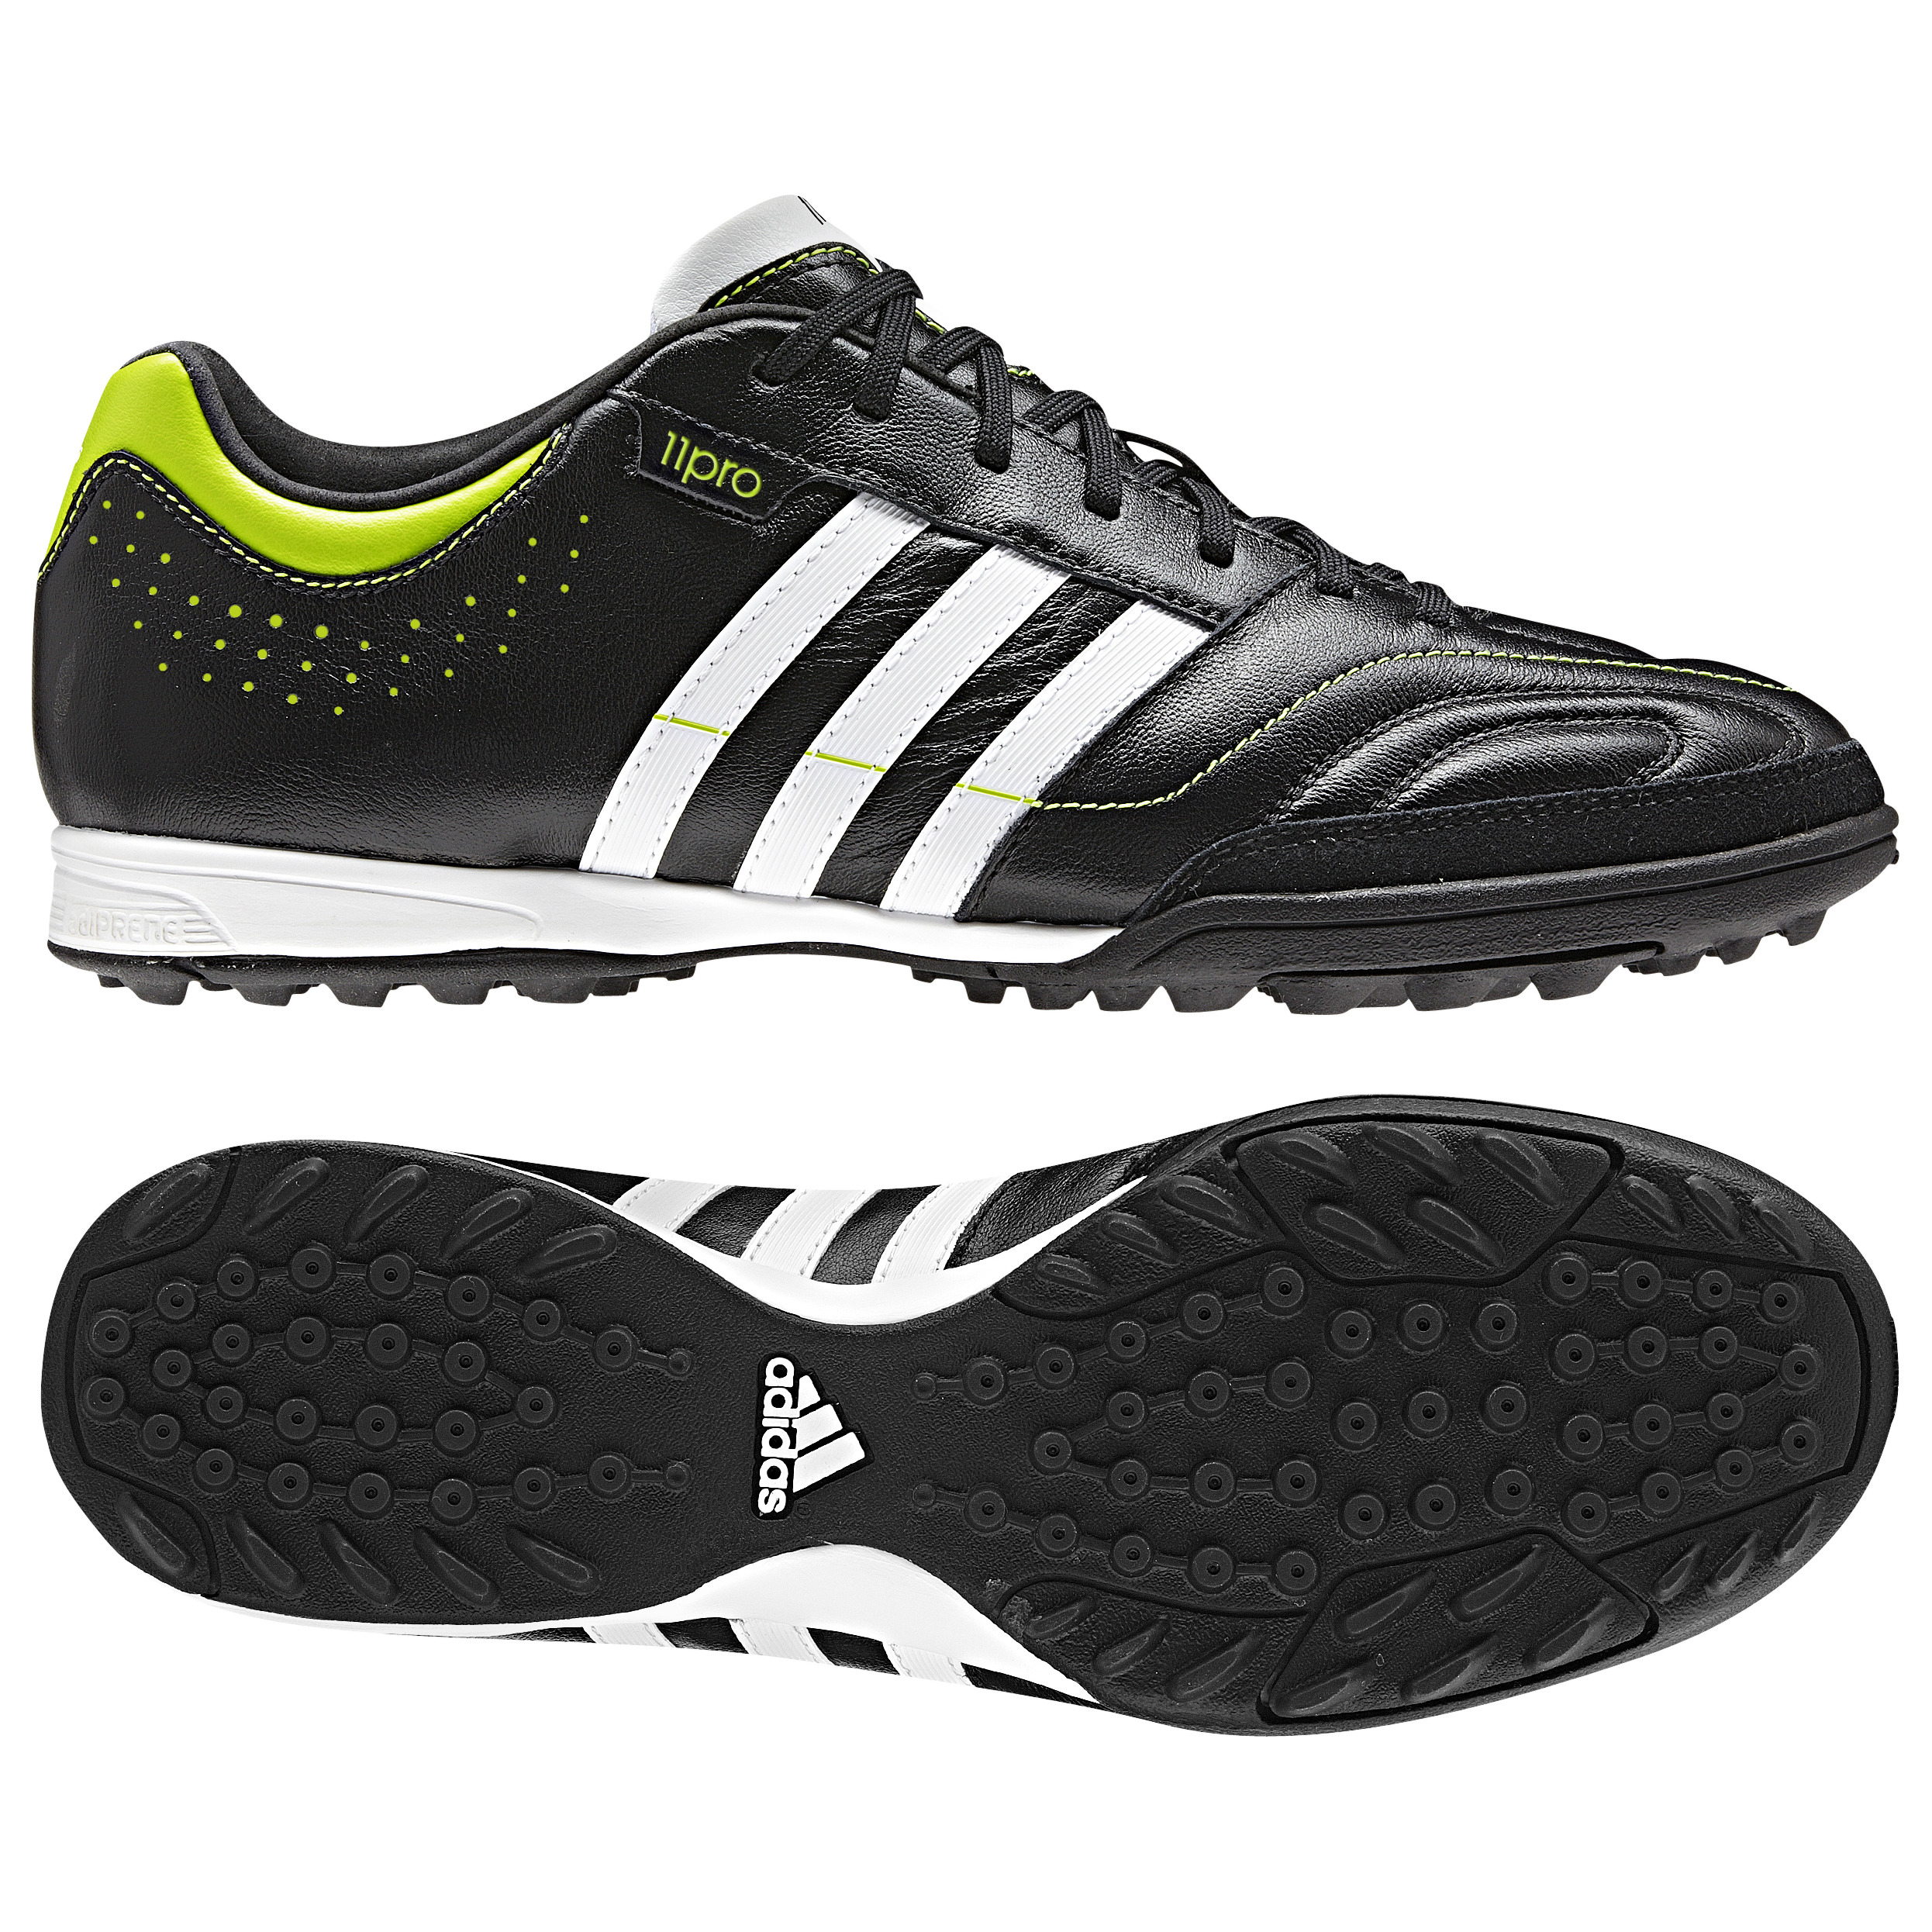 adidas 11Nova TRX Astro Turf Trainers - Black 1/Running White/Slime